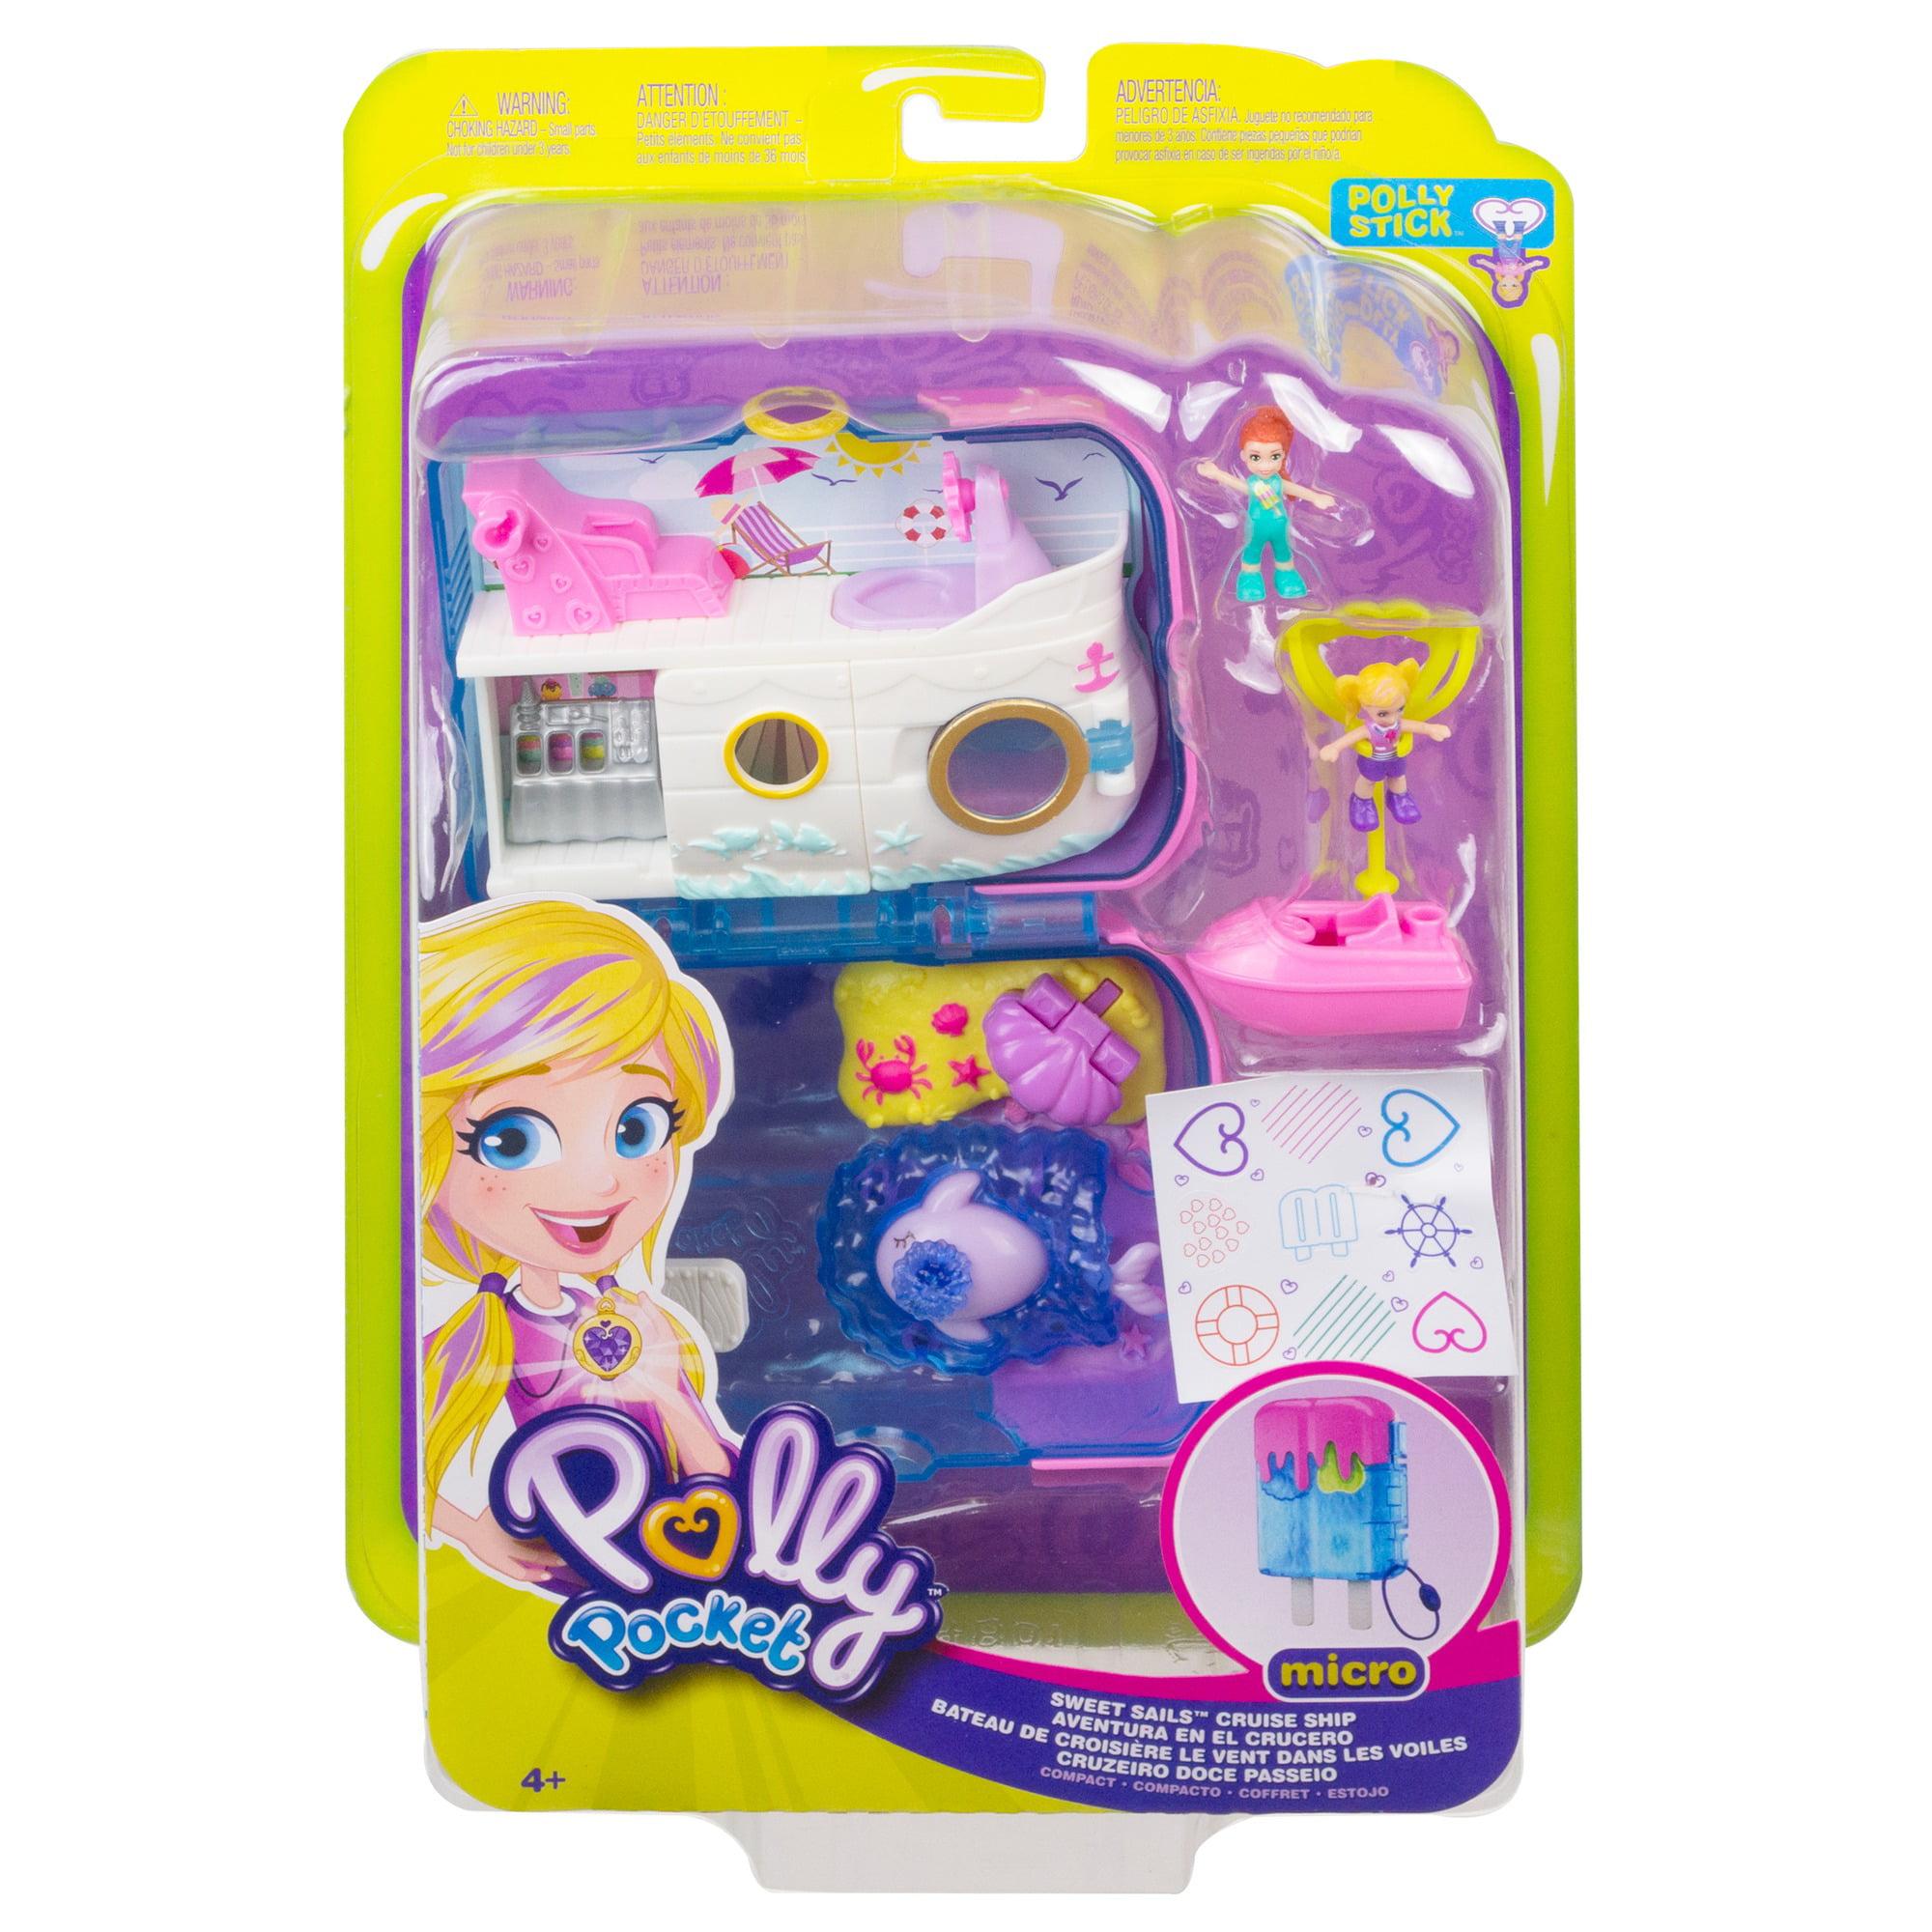 NEW 2 Micro Dolls Polly Pocket Pocket World Sweet Sails Cruise Ship Compact